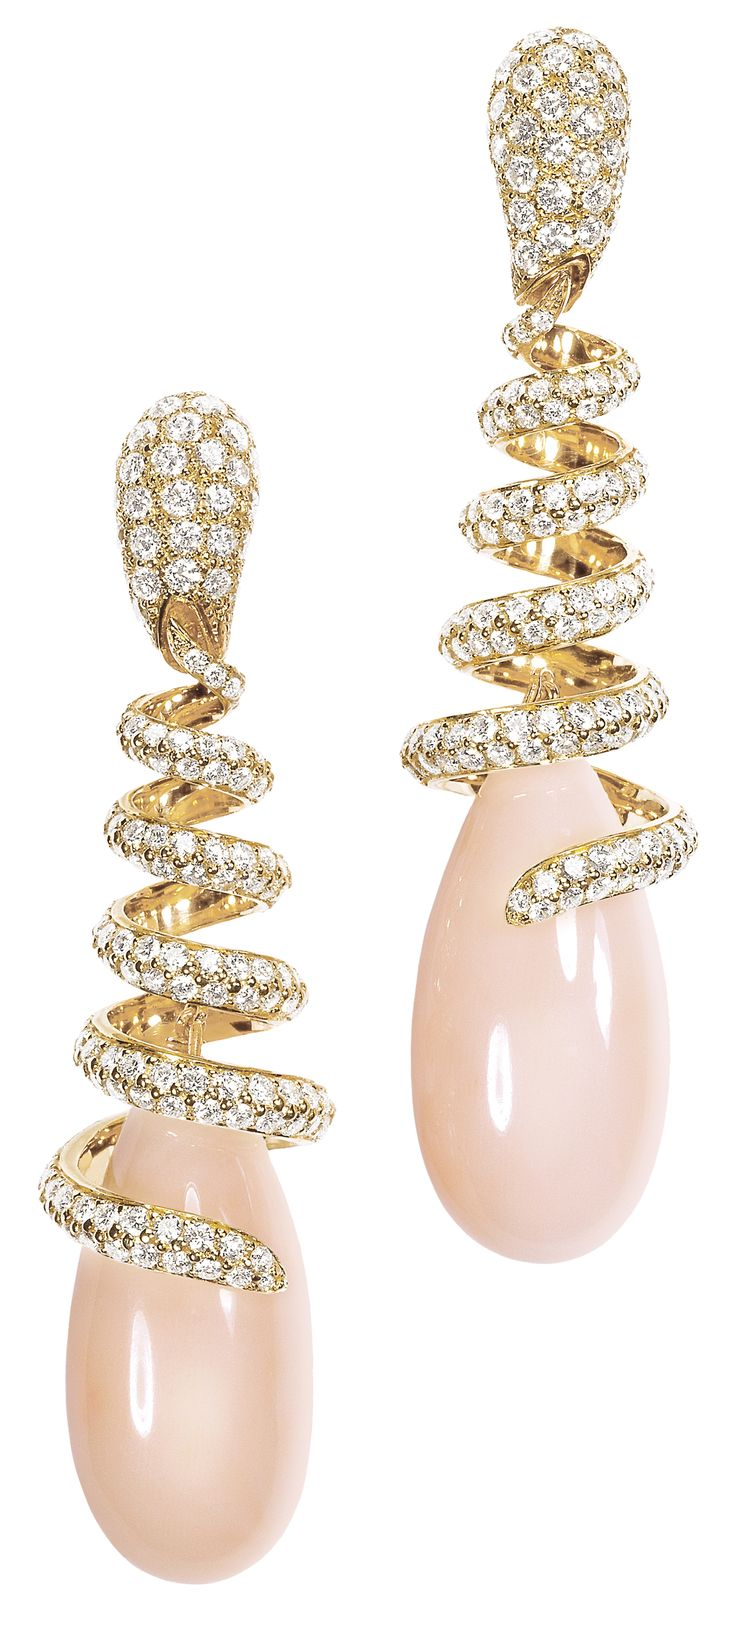 De Grisogono High Jewellery: coral and diamond drop earrings.♥✤ | KeepSmiling | BeStayBeautiful